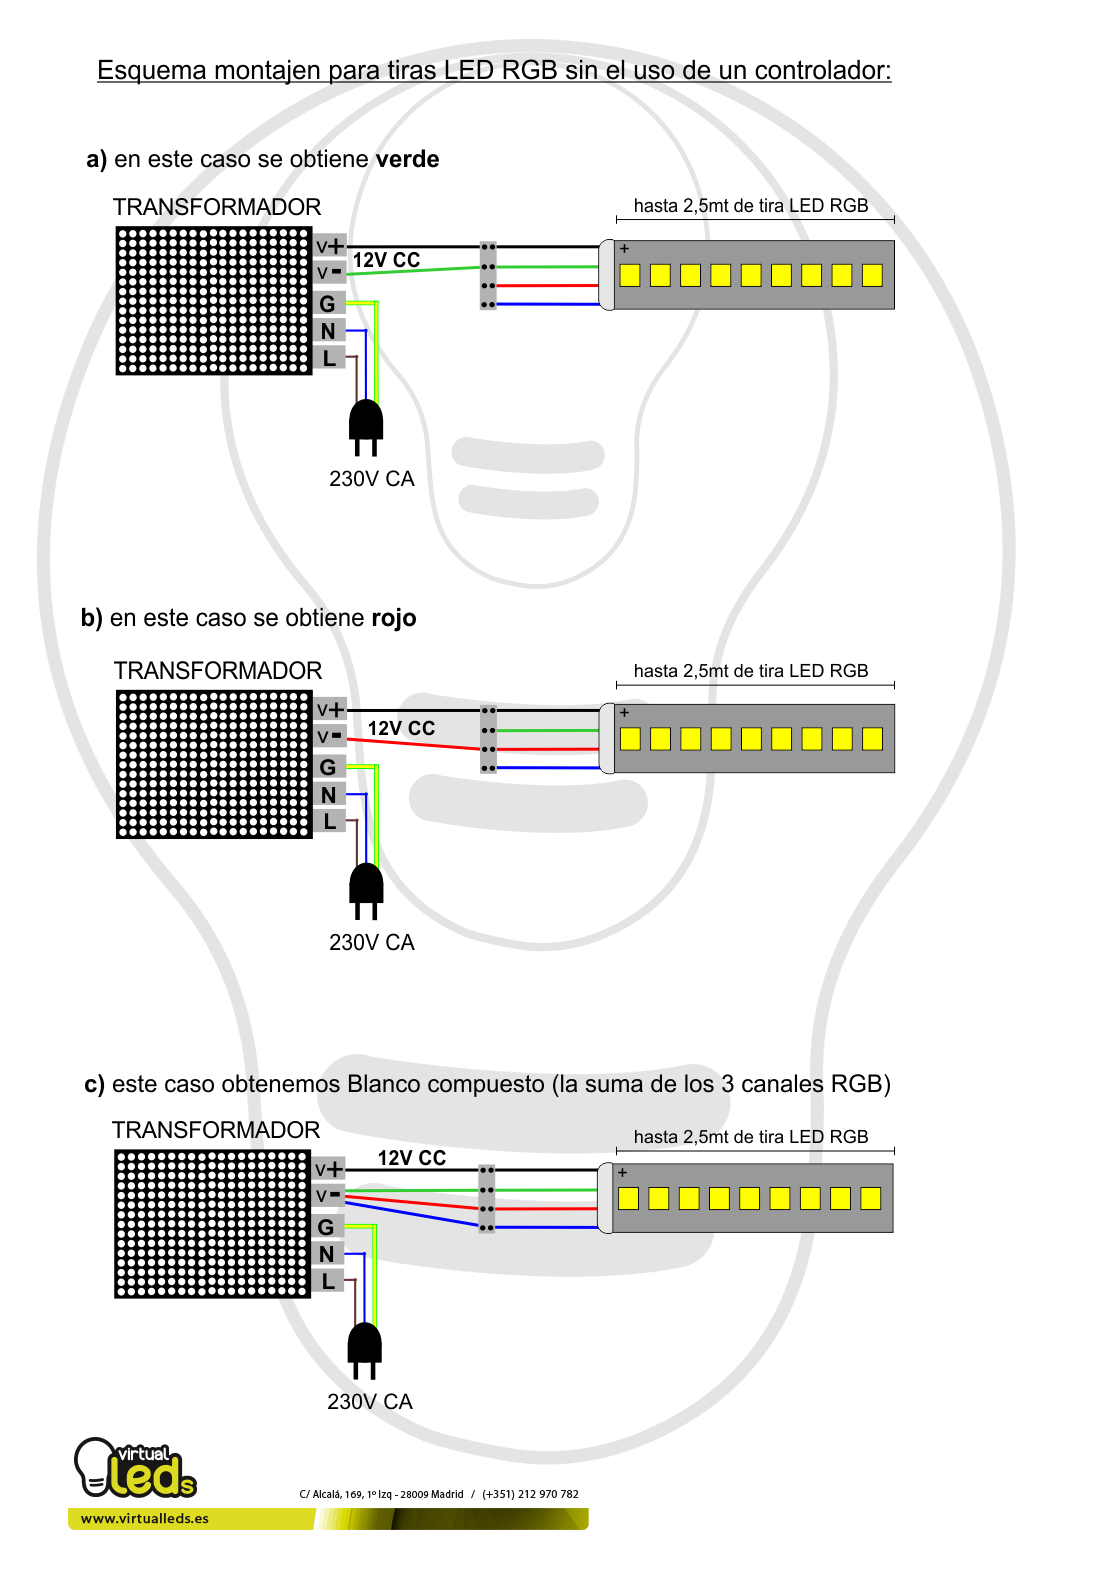 Esquema-montajen-para-tiras-LED-RGB-sin-controlador